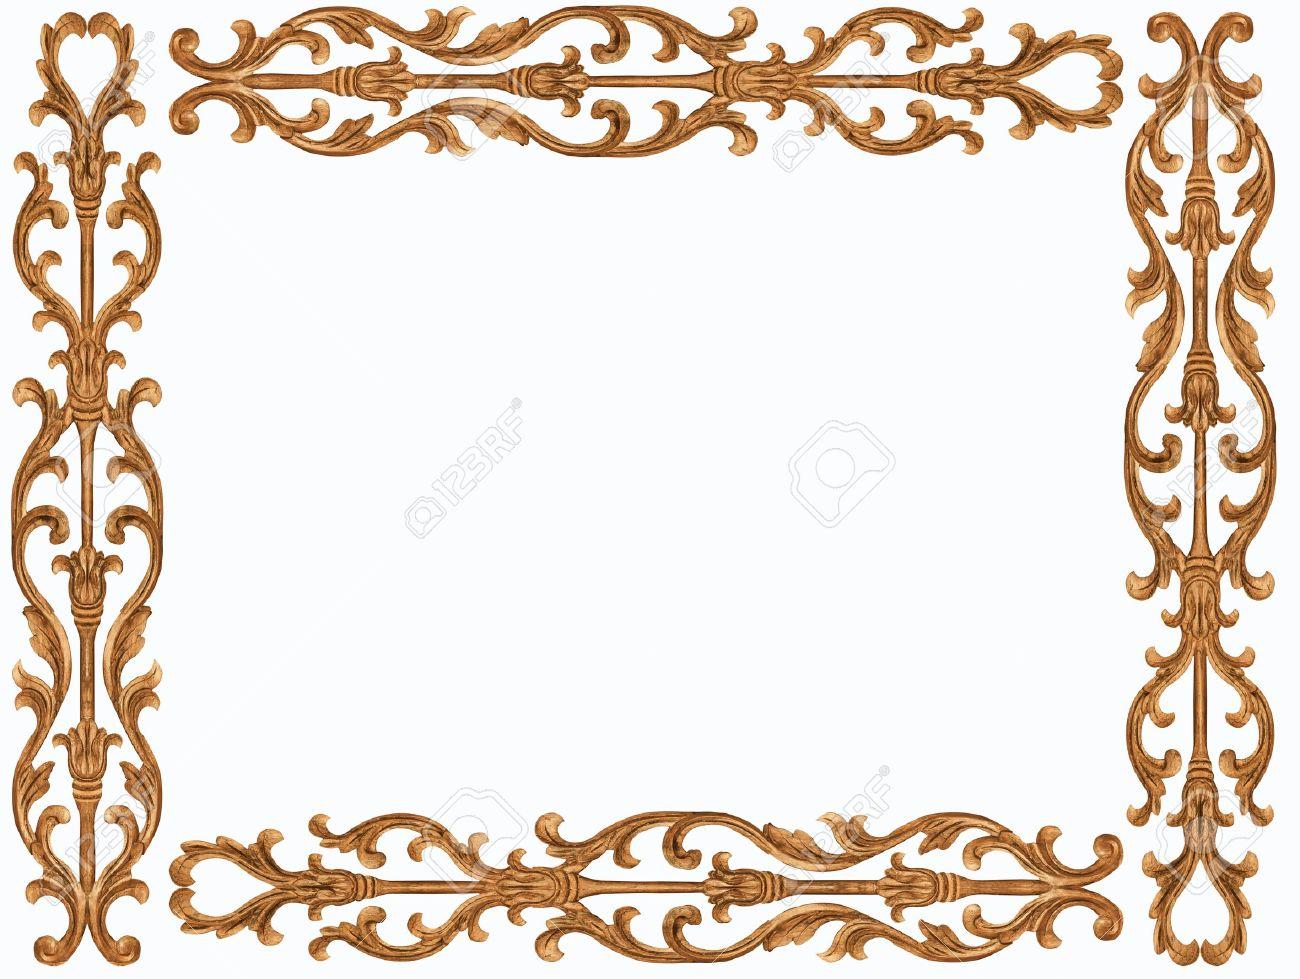 Pattern of flower carved frame on white background - 16231074